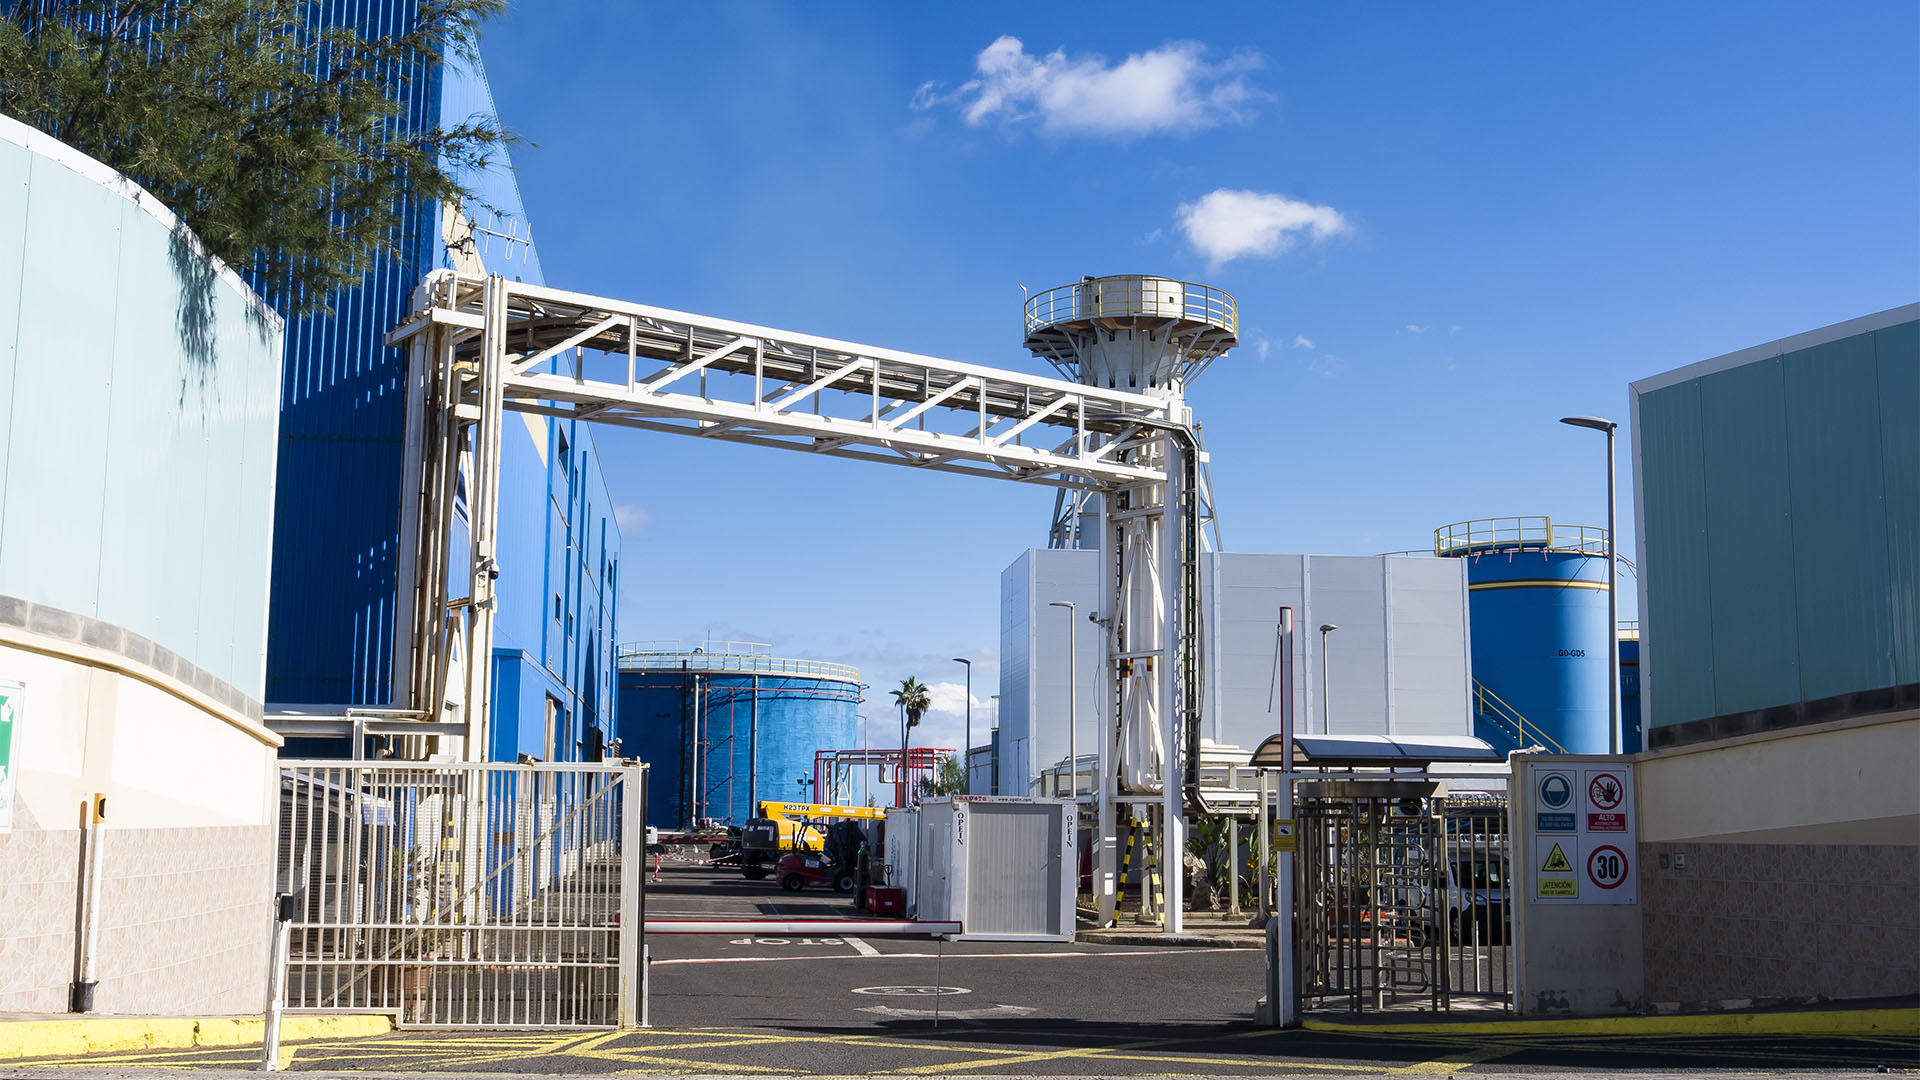 Kraftwerk Puerto del Rosario Fuerteventura.